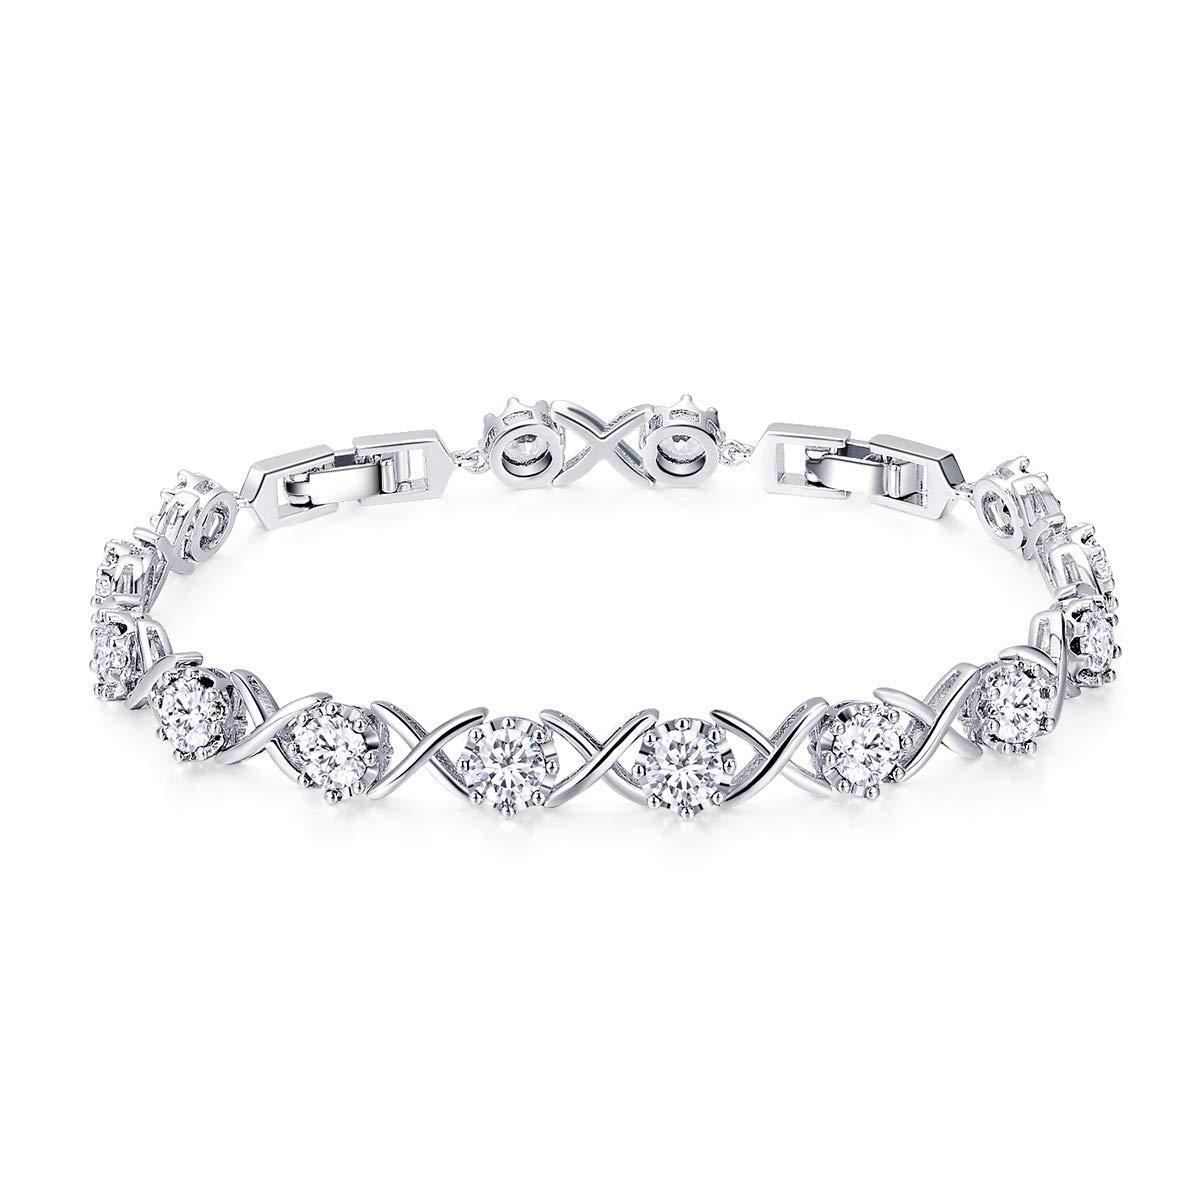 WOSTU Women Tennis Bracelets Platinum Plated Infinity XO Link Cubic Zirconia Bracelets Gifts for her